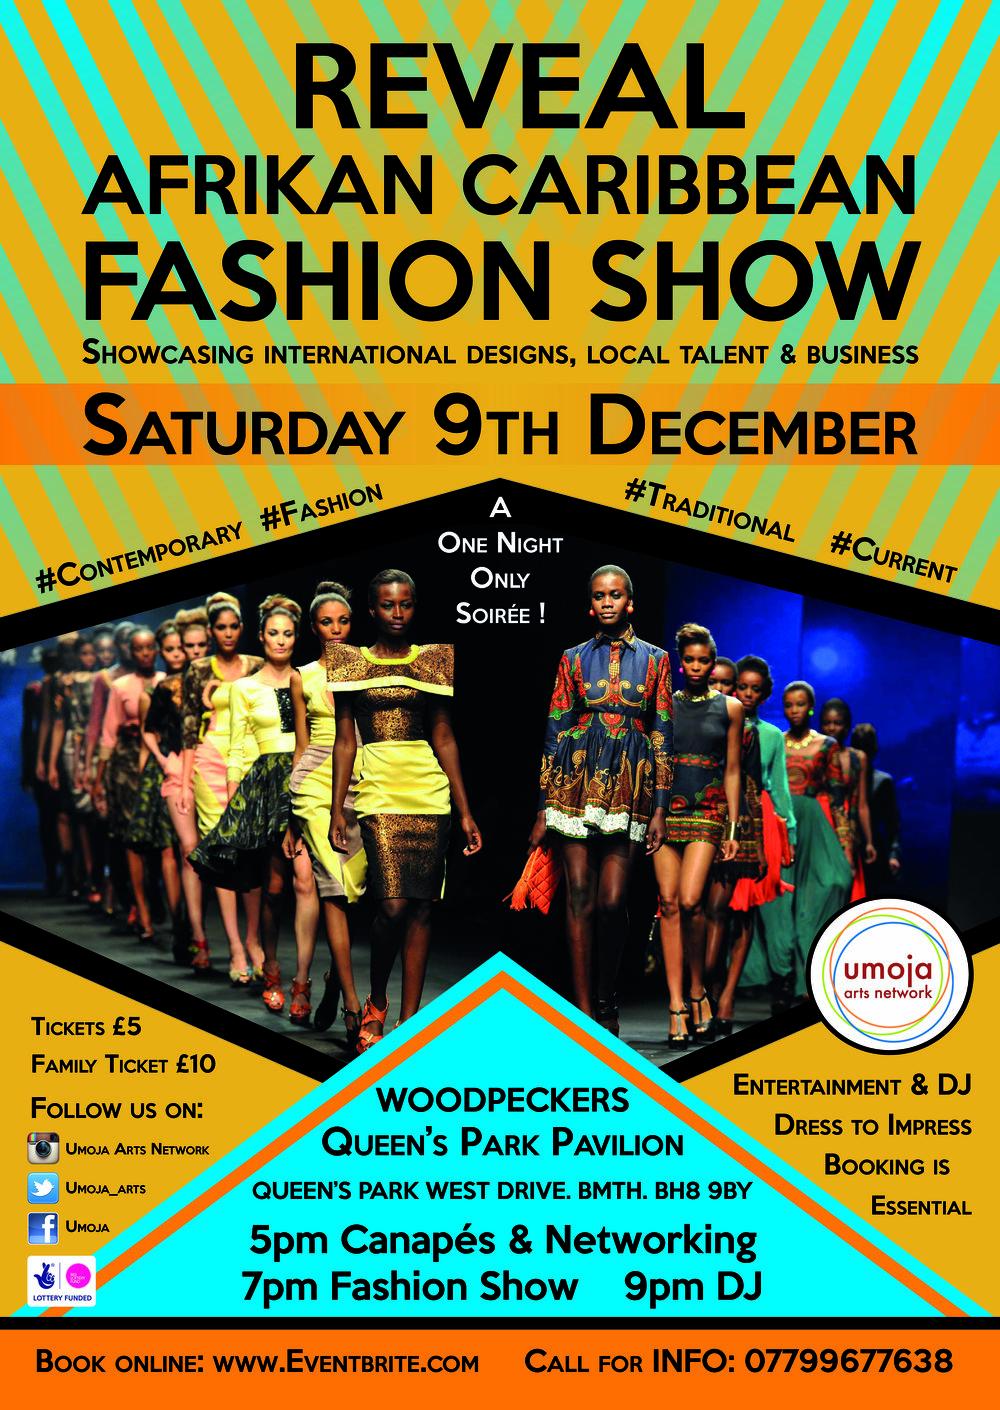 Fashion Show Poster - CMYK  -2.jpg